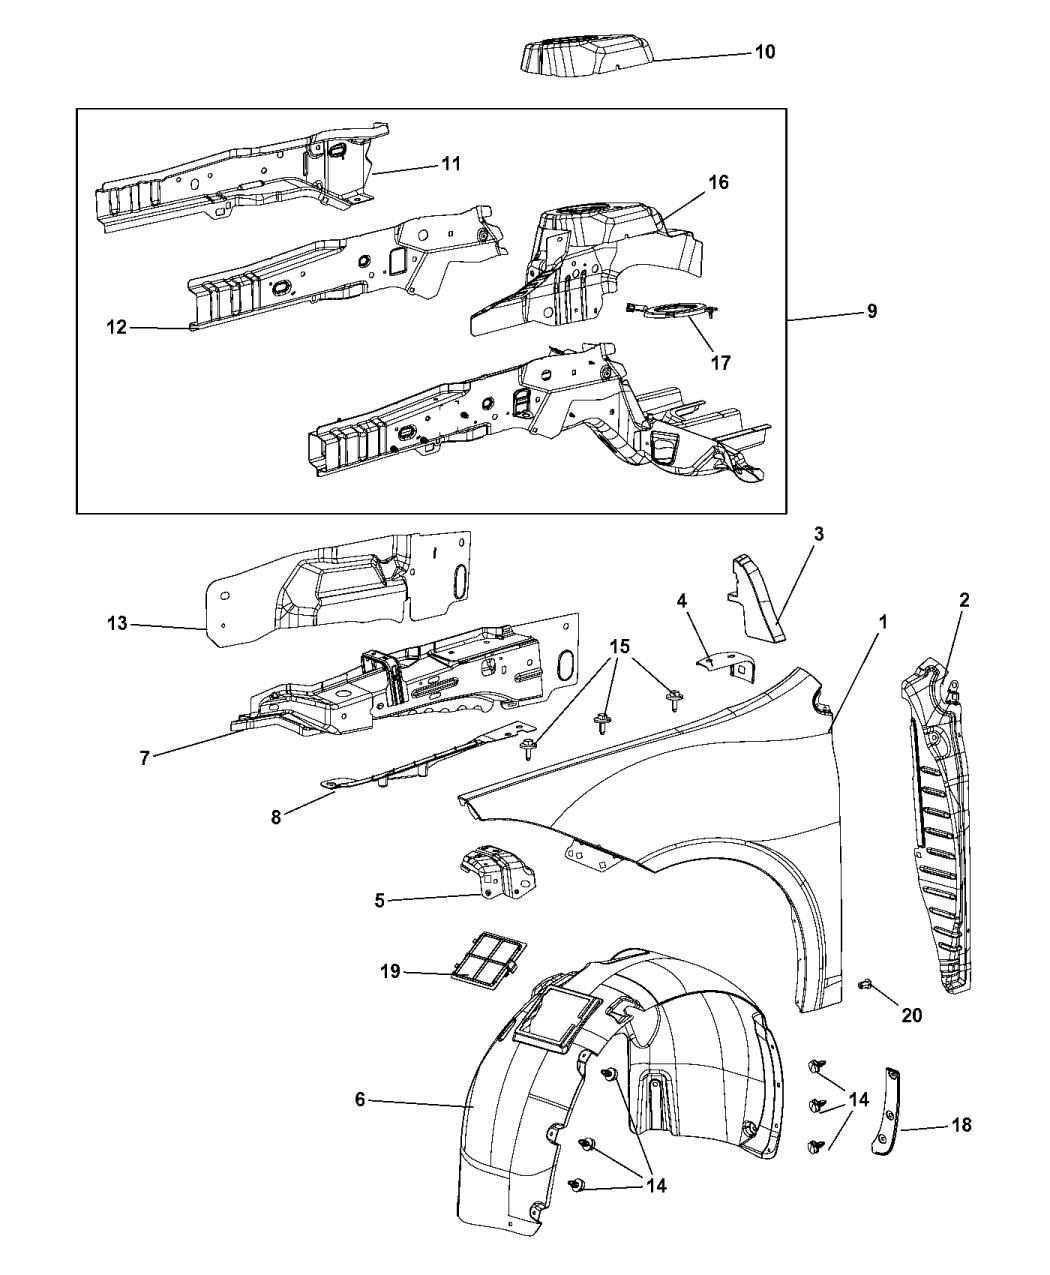 2015 dodge dart front fender mopar parts giant rh moparpartsgiant com 1963 Dodge Dart Repair Manual 2013 Dodge Dart Manual Transmission